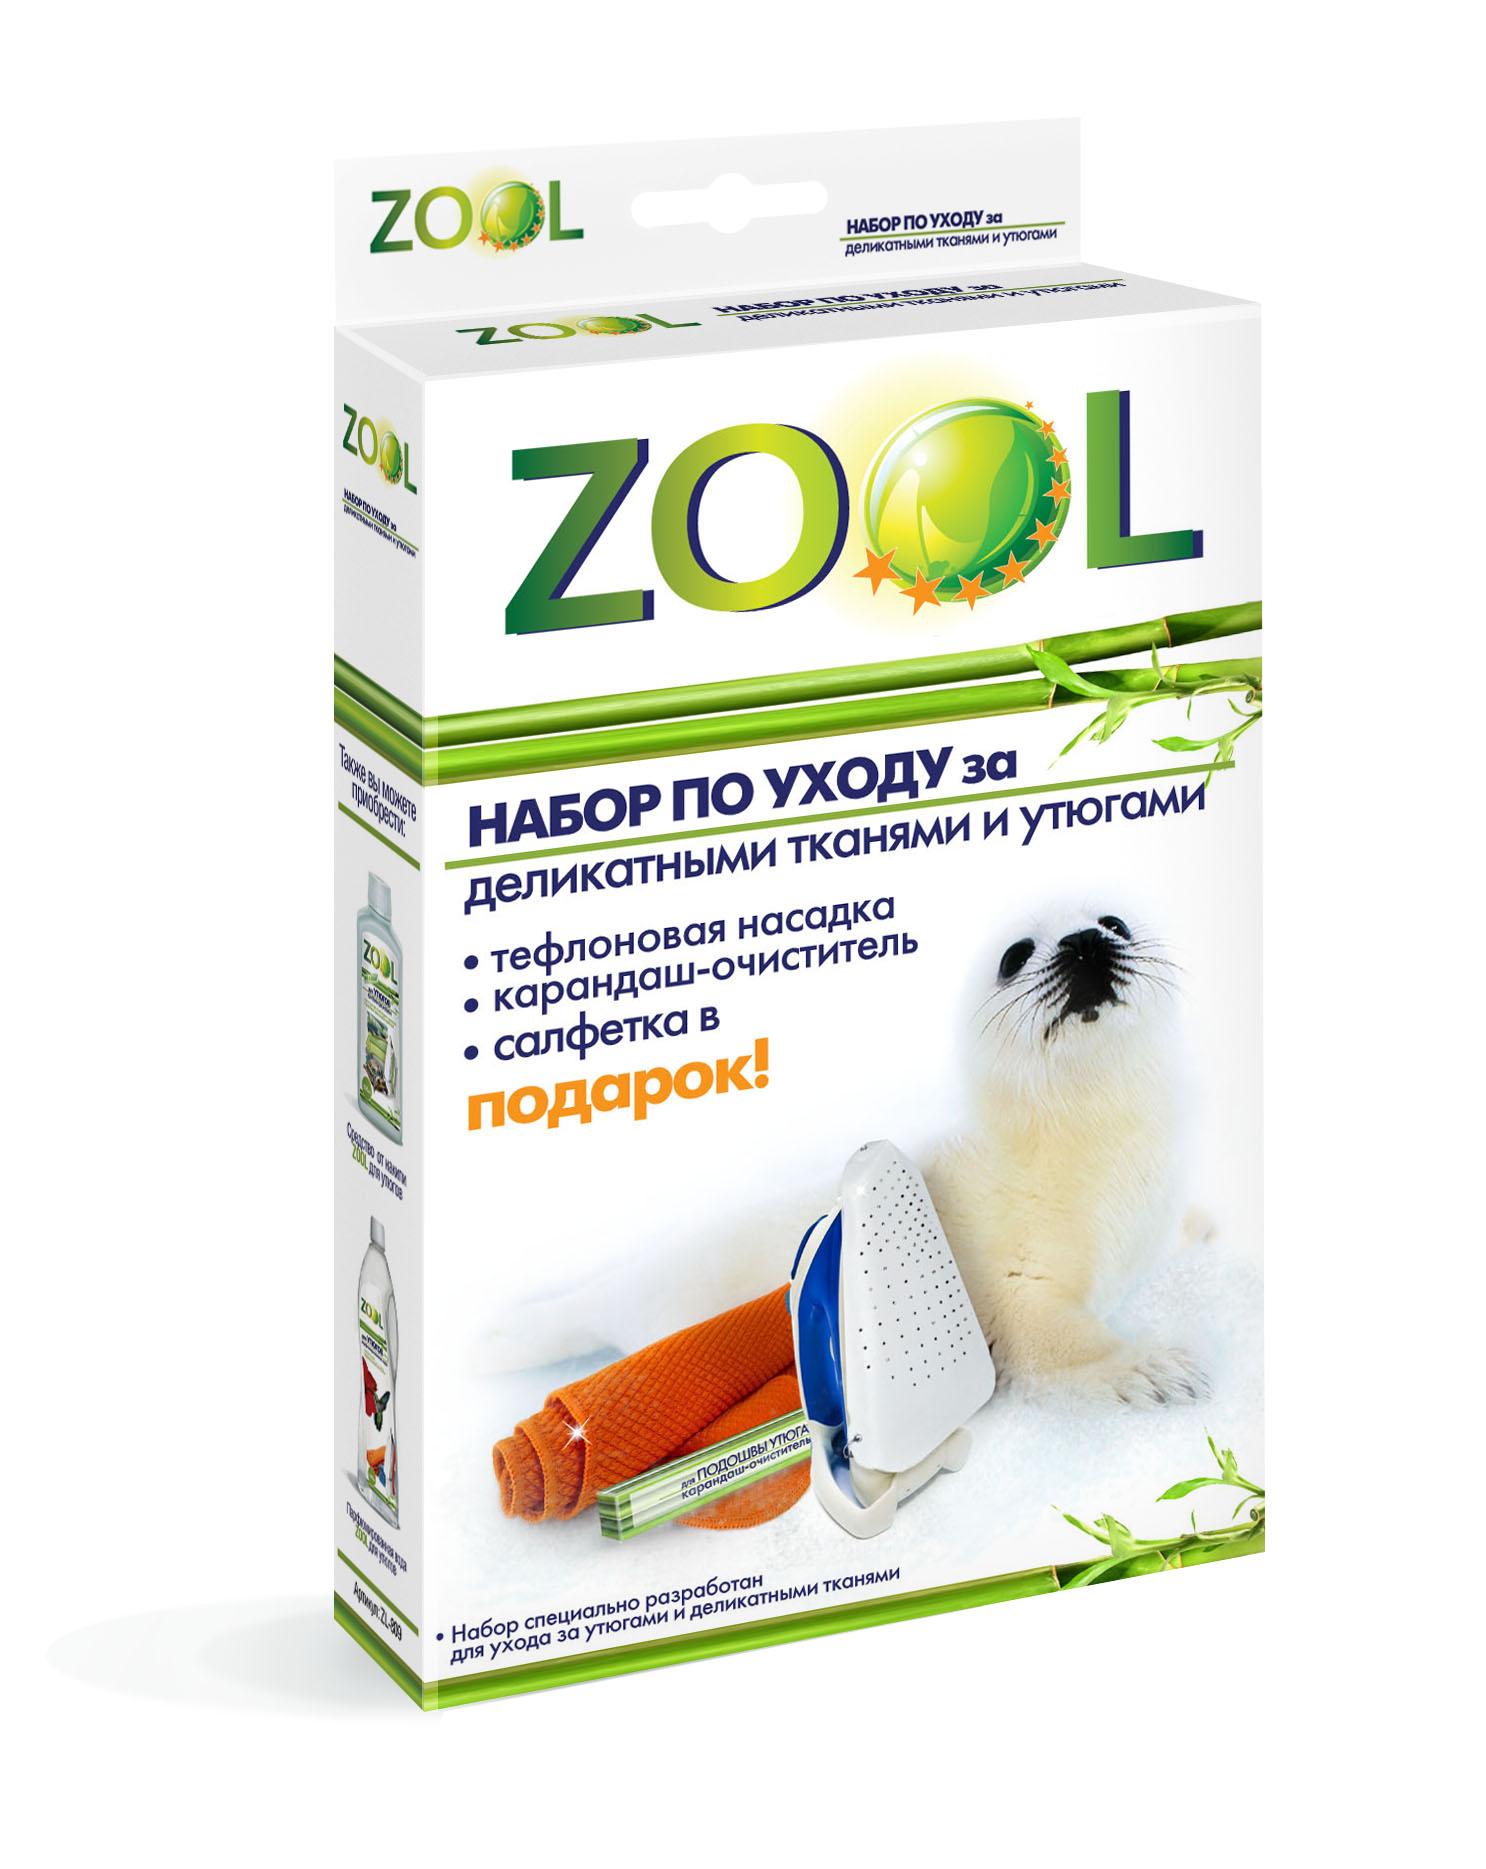 Аксессуары для утюгов Zool Real Brand Technics 351.000